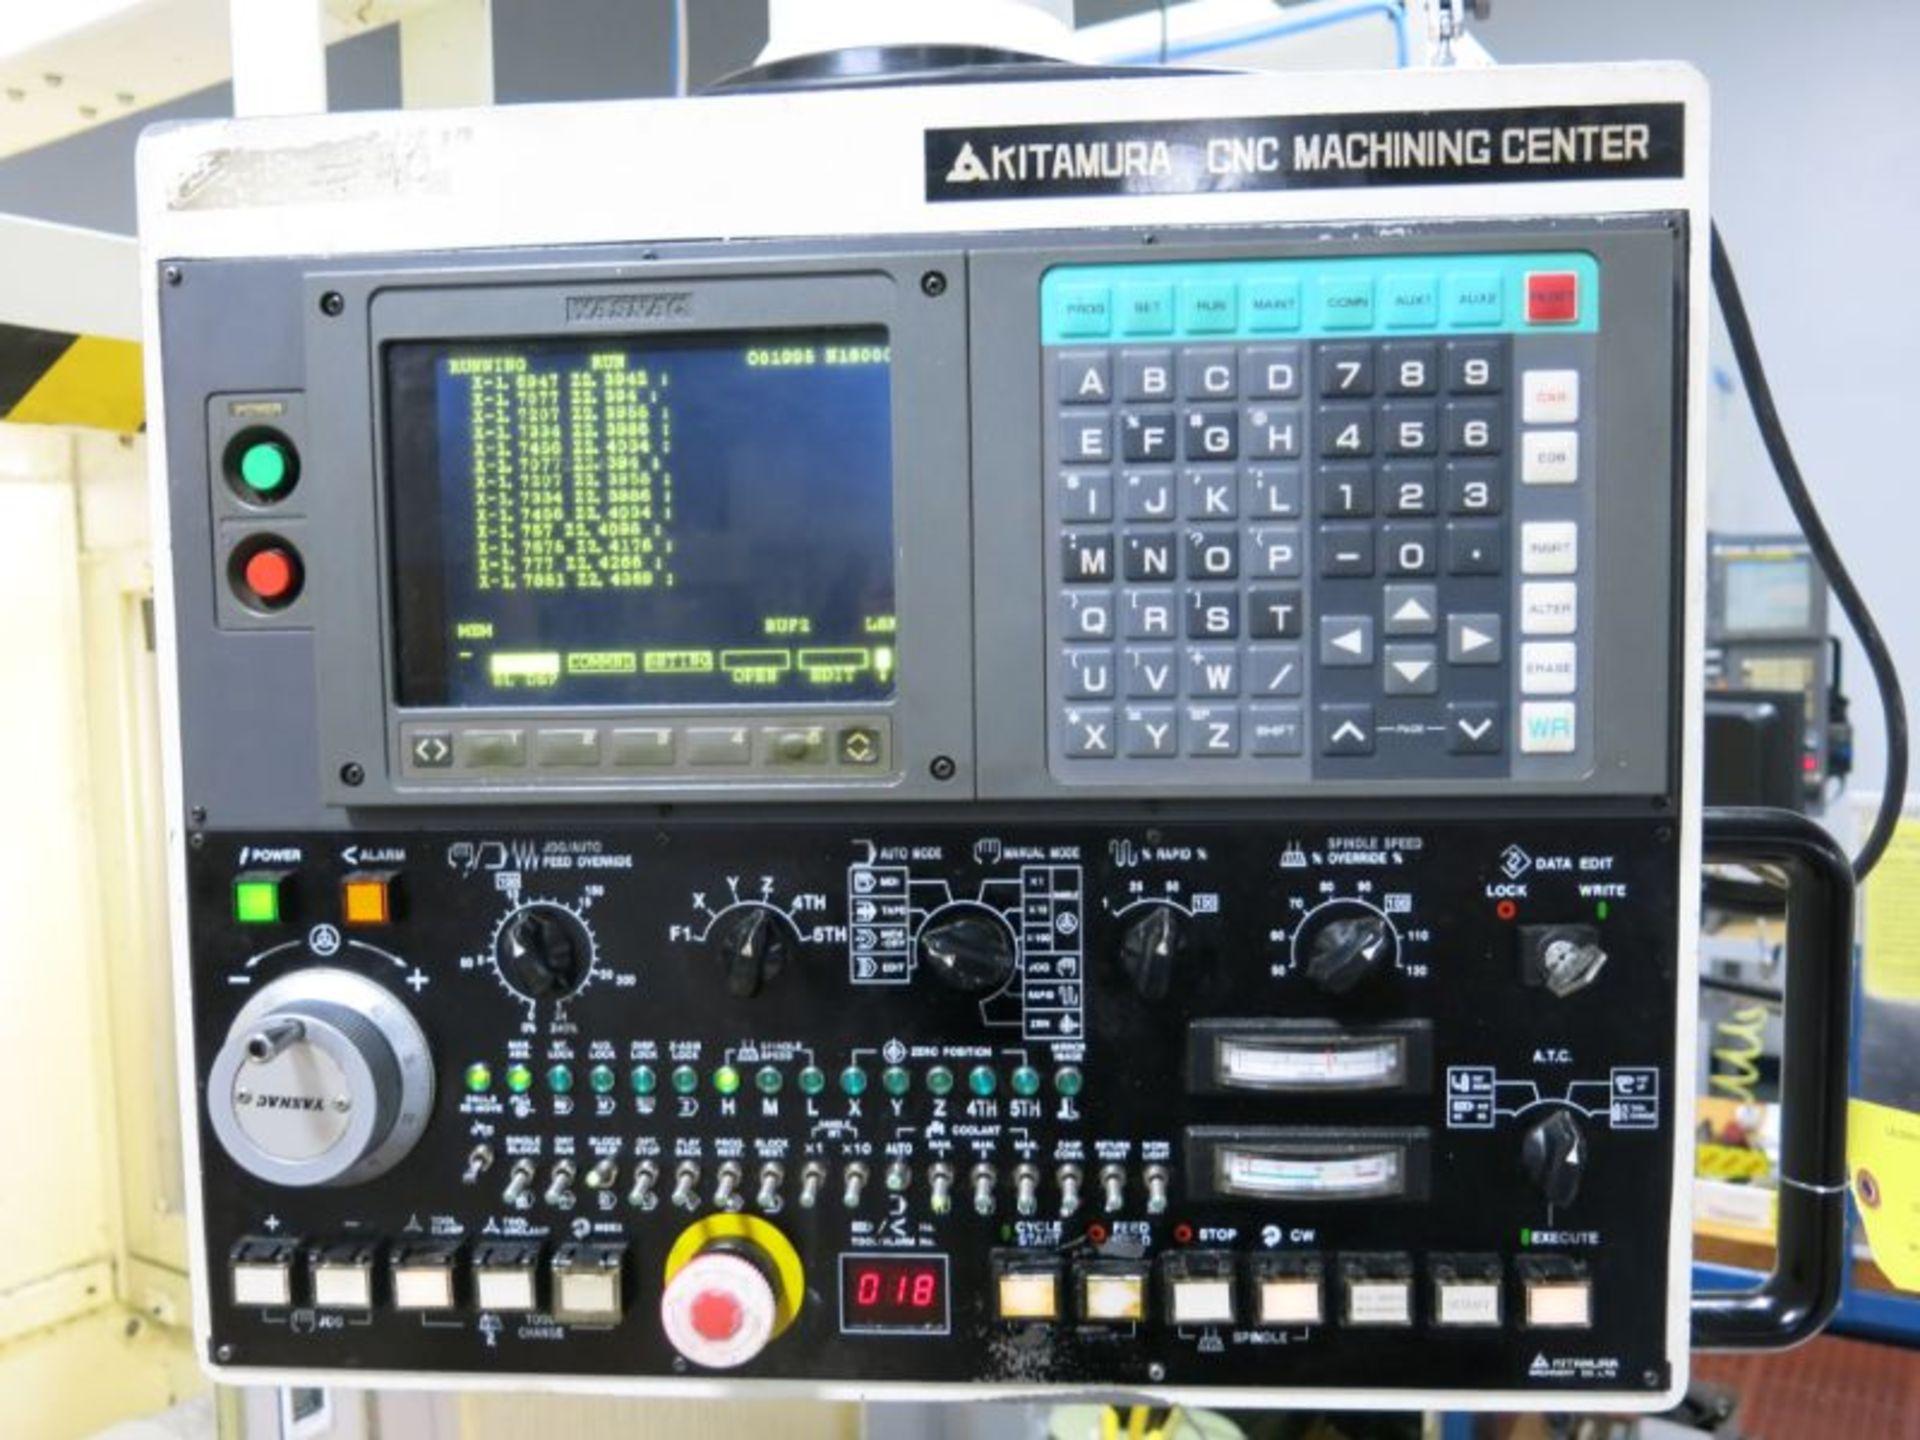 1998 Kitamura Mycenter 3X CNC VMC - Image 5 of 6